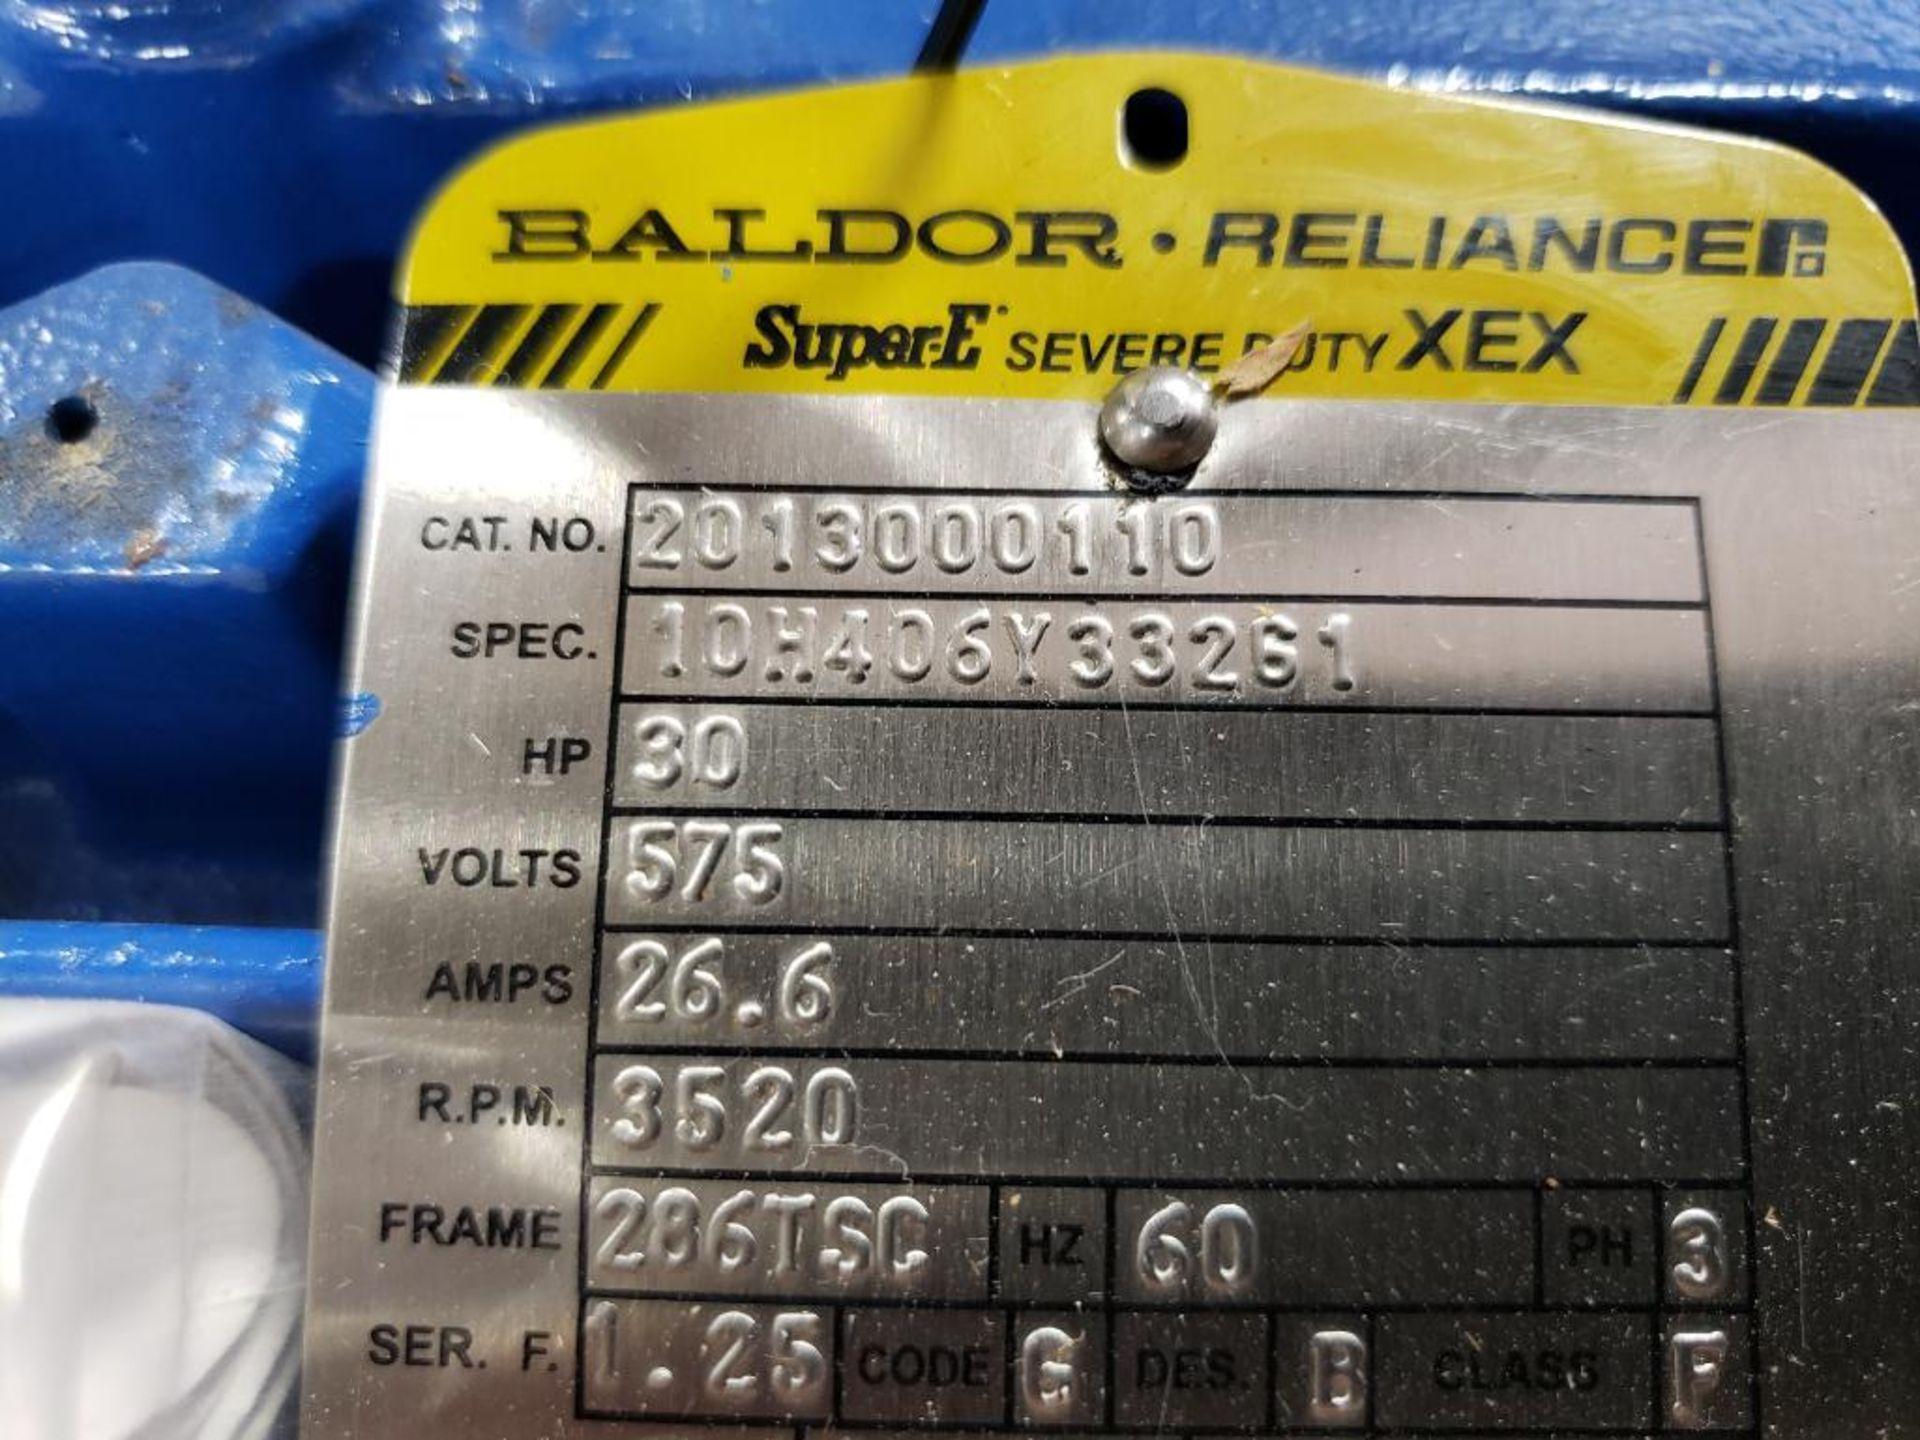 30HP Baldor Reliance 3PH motor. 2013000110. 575V, 3520RPM, 286TSC-Frame. - Image 3 of 6